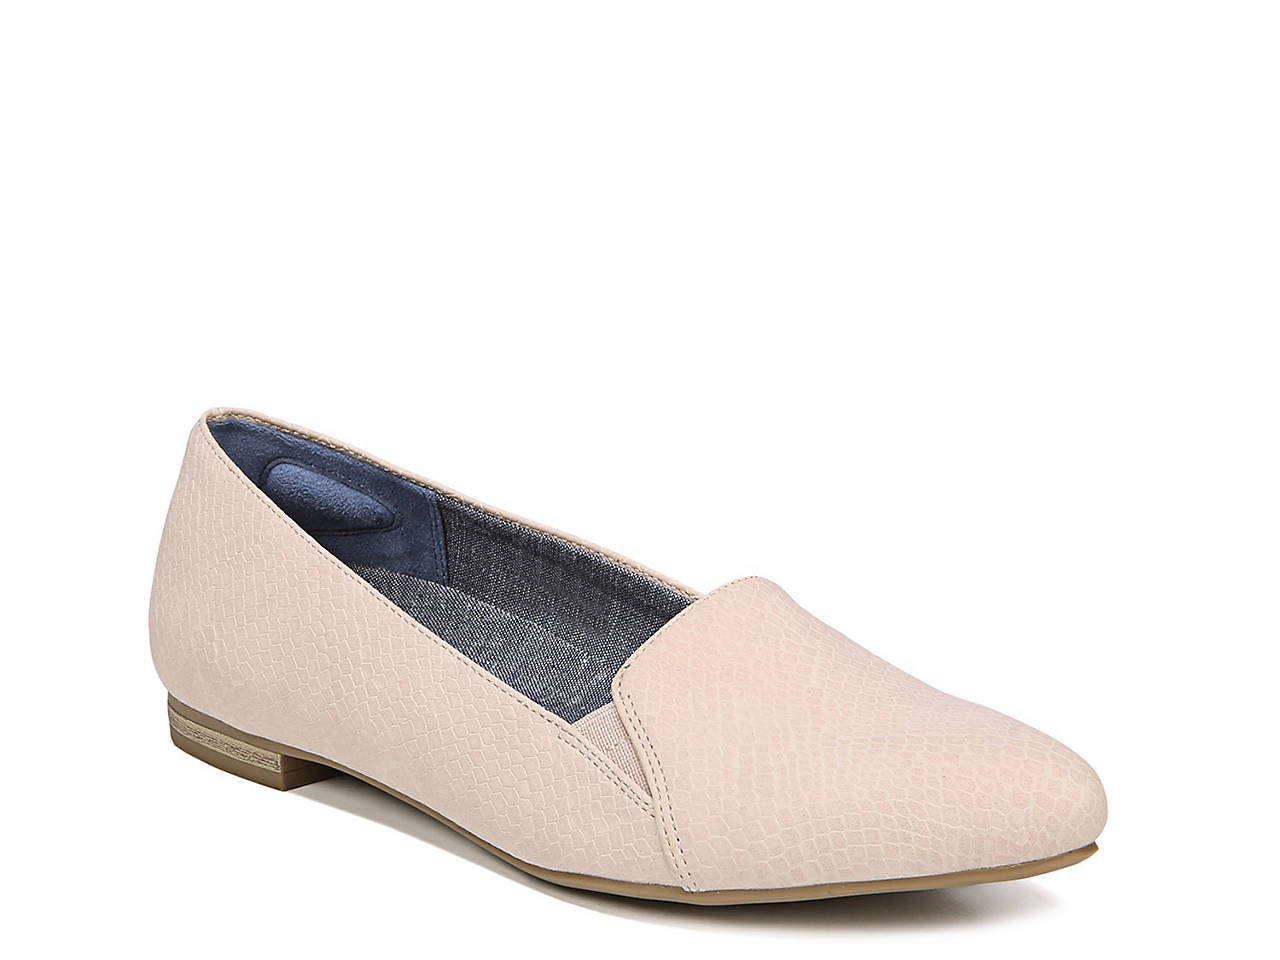 a1331ec06591 Dr. Scholl's Anyways Flat Women's Shoes | DSW